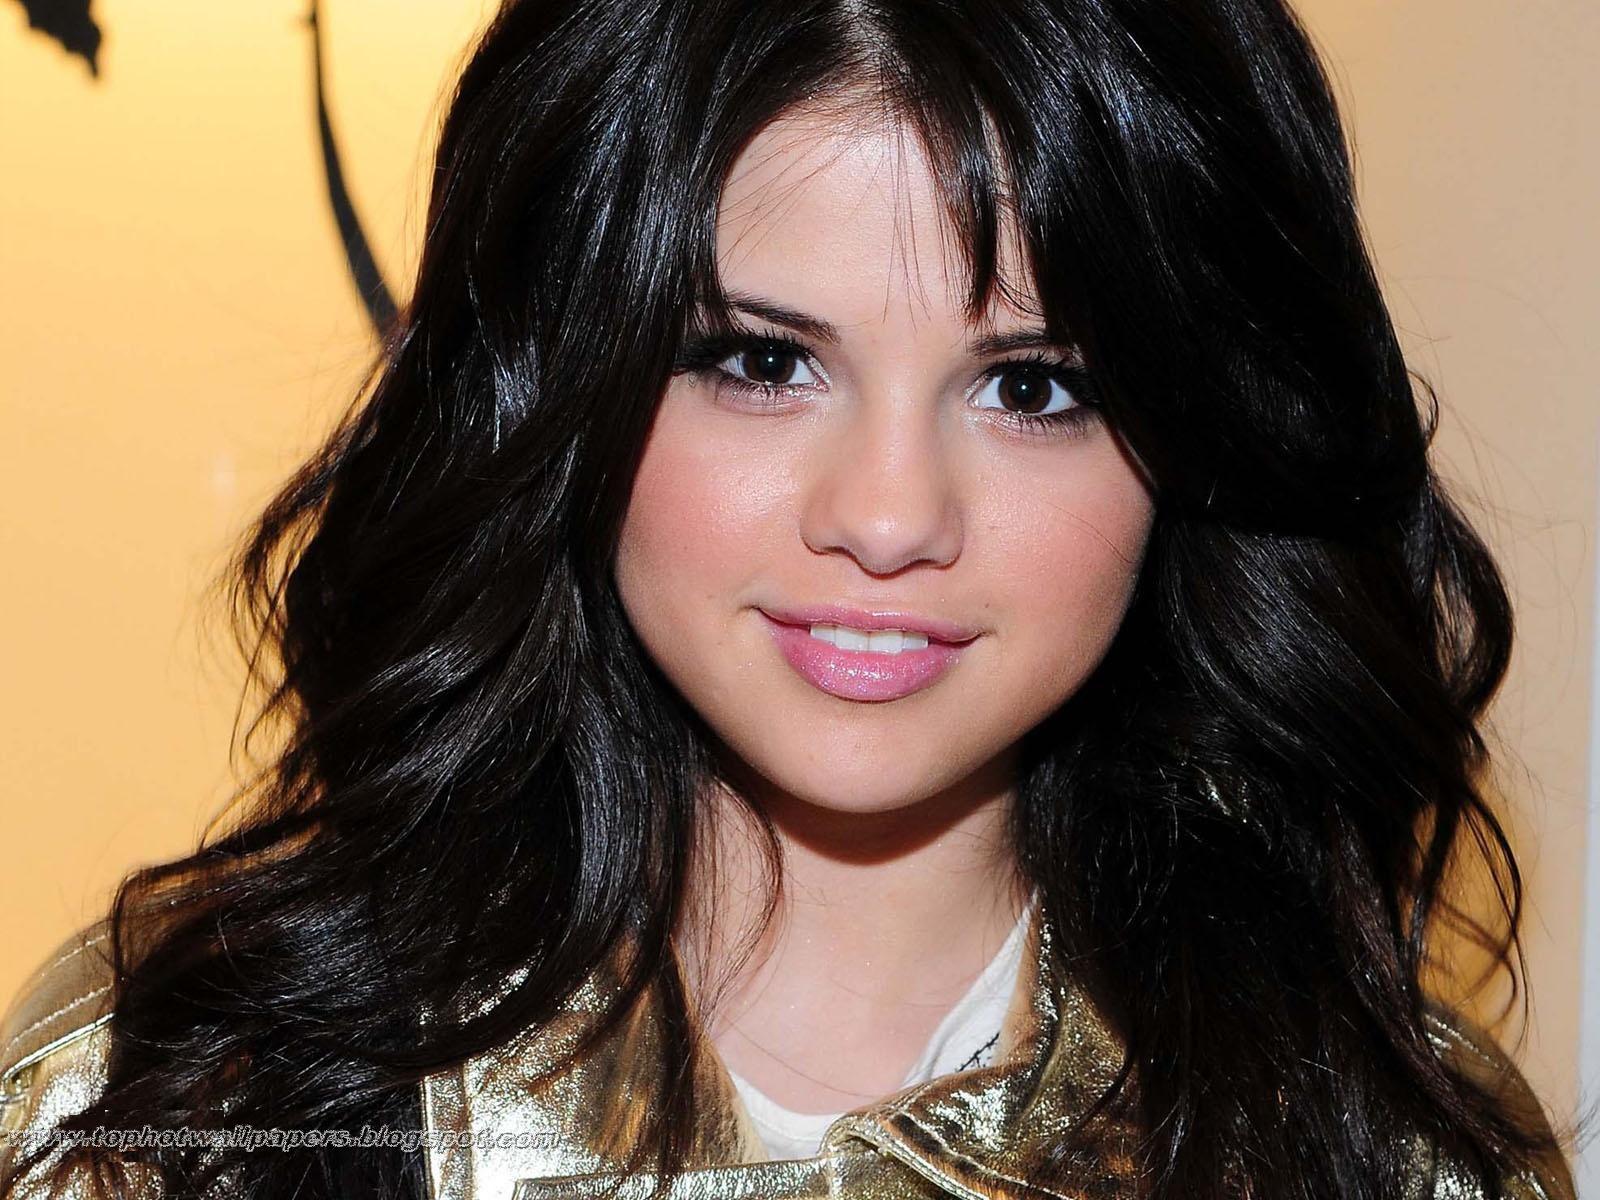 http://4.bp.blogspot.com/-Dj7qg9LGJJM/TZAHWmmTjLI/AAAAAAAAjtE/BRnysxhdyHo/s1600/Selena%252BGomez%252BProfile.jpg